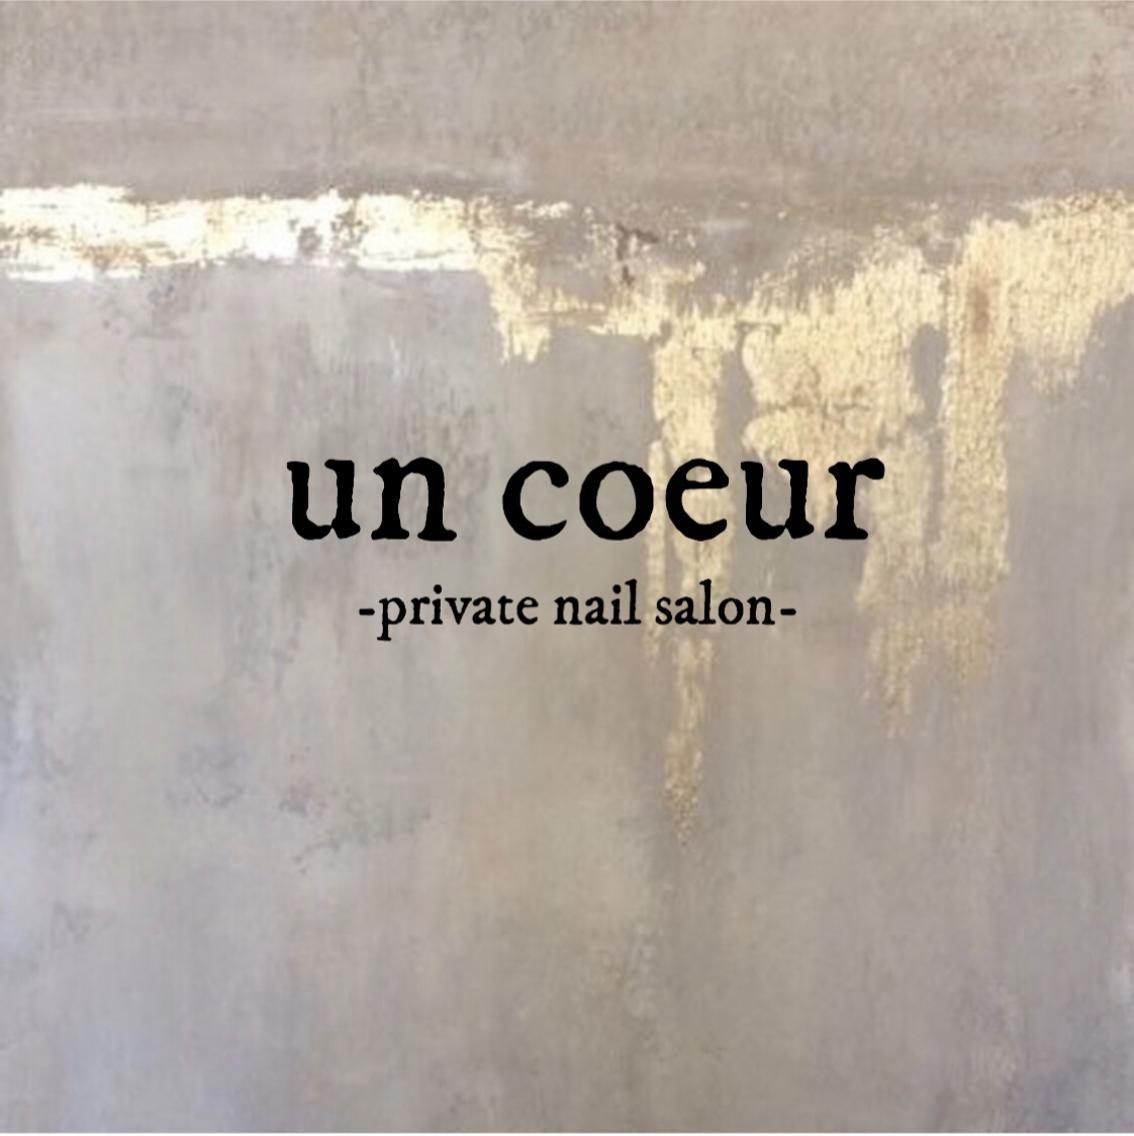 un coeur所属・un coeur [アンクール]の掲載